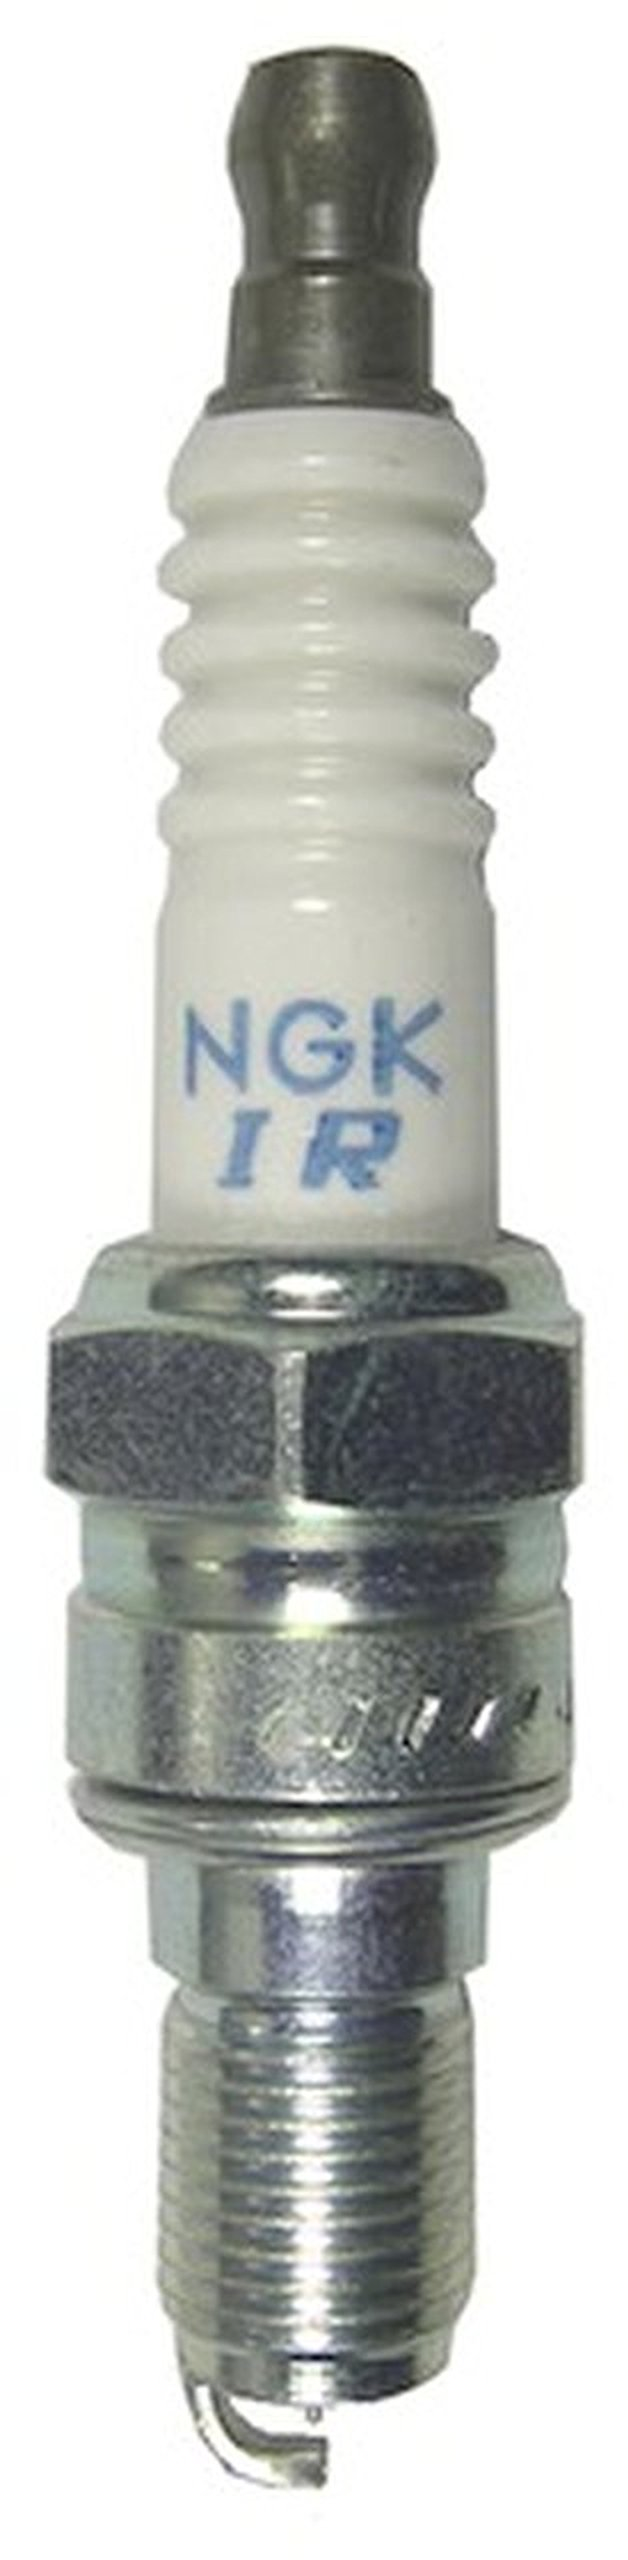 6544 Pack of 1 IMR9D-9H Laser Iridium Spark Plug NGK